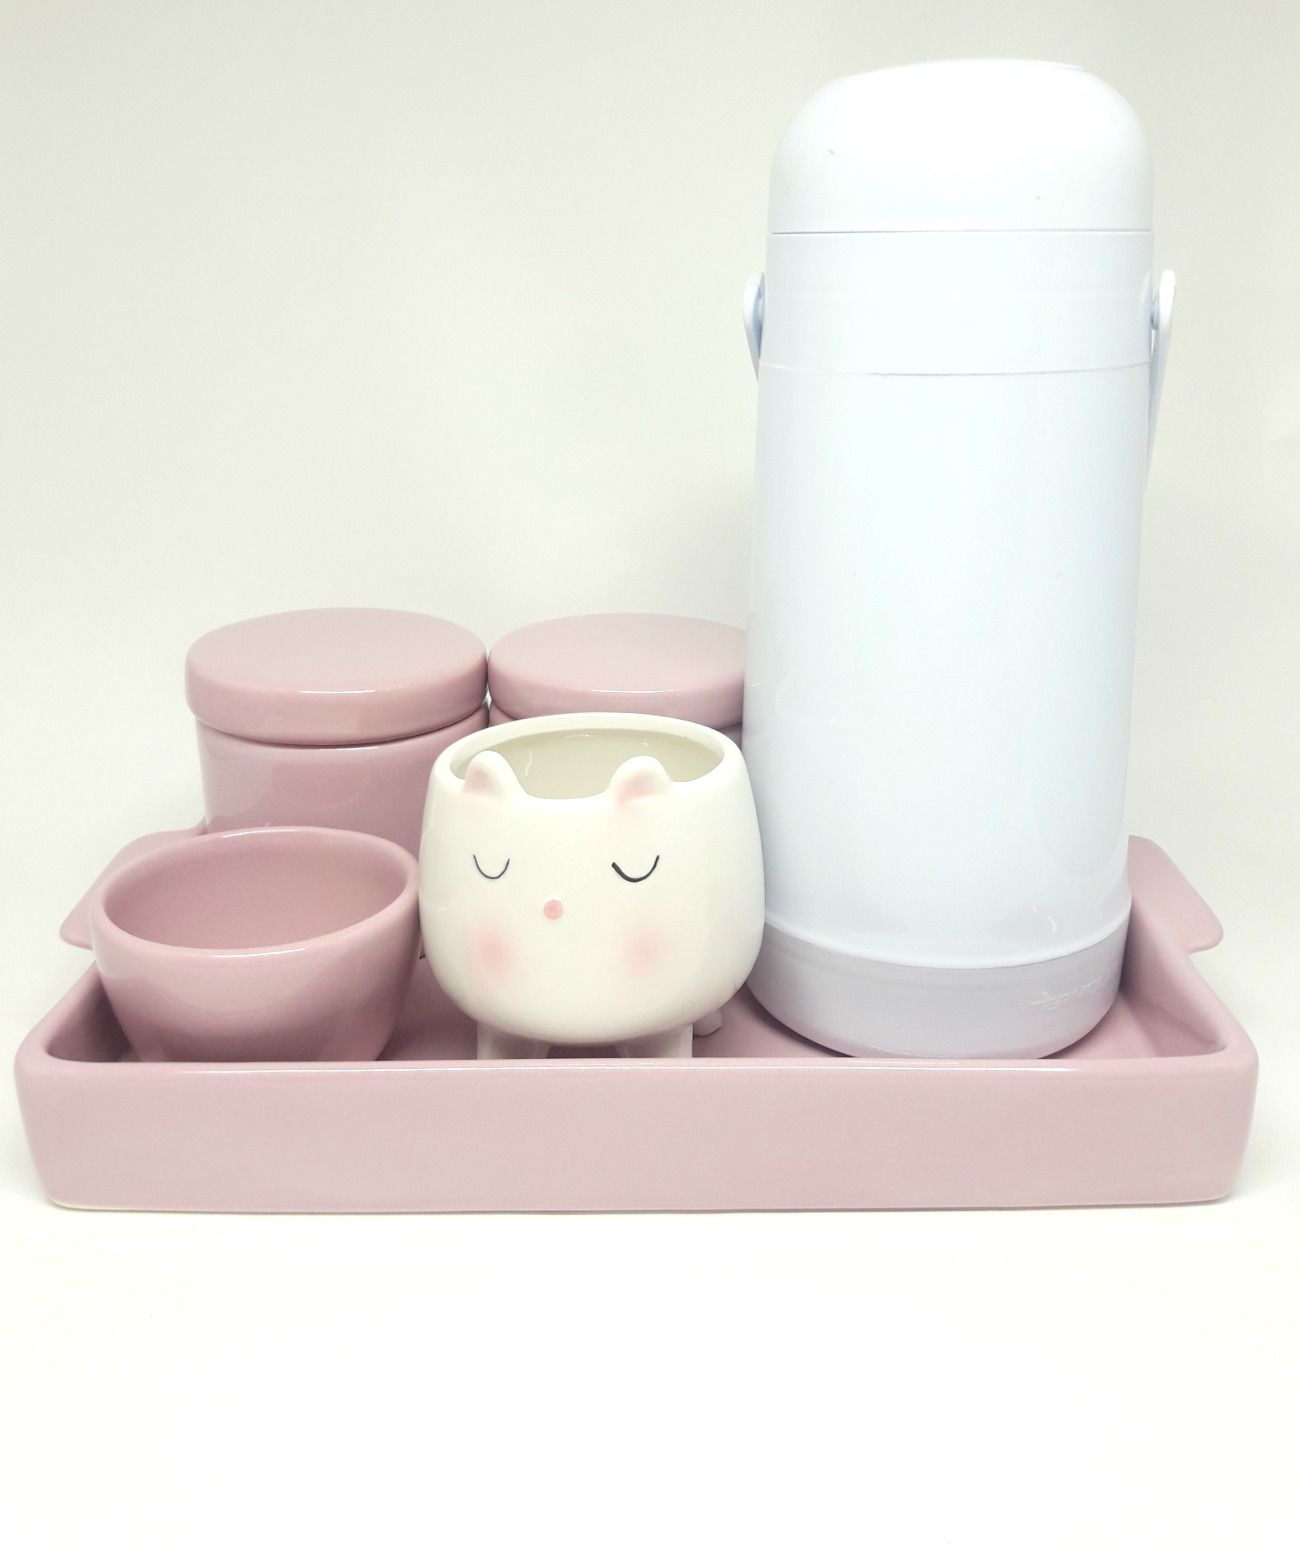 Kit Higiene Cerâmica Rosa Bebê com Cachepot & Bandeja & Garrafa